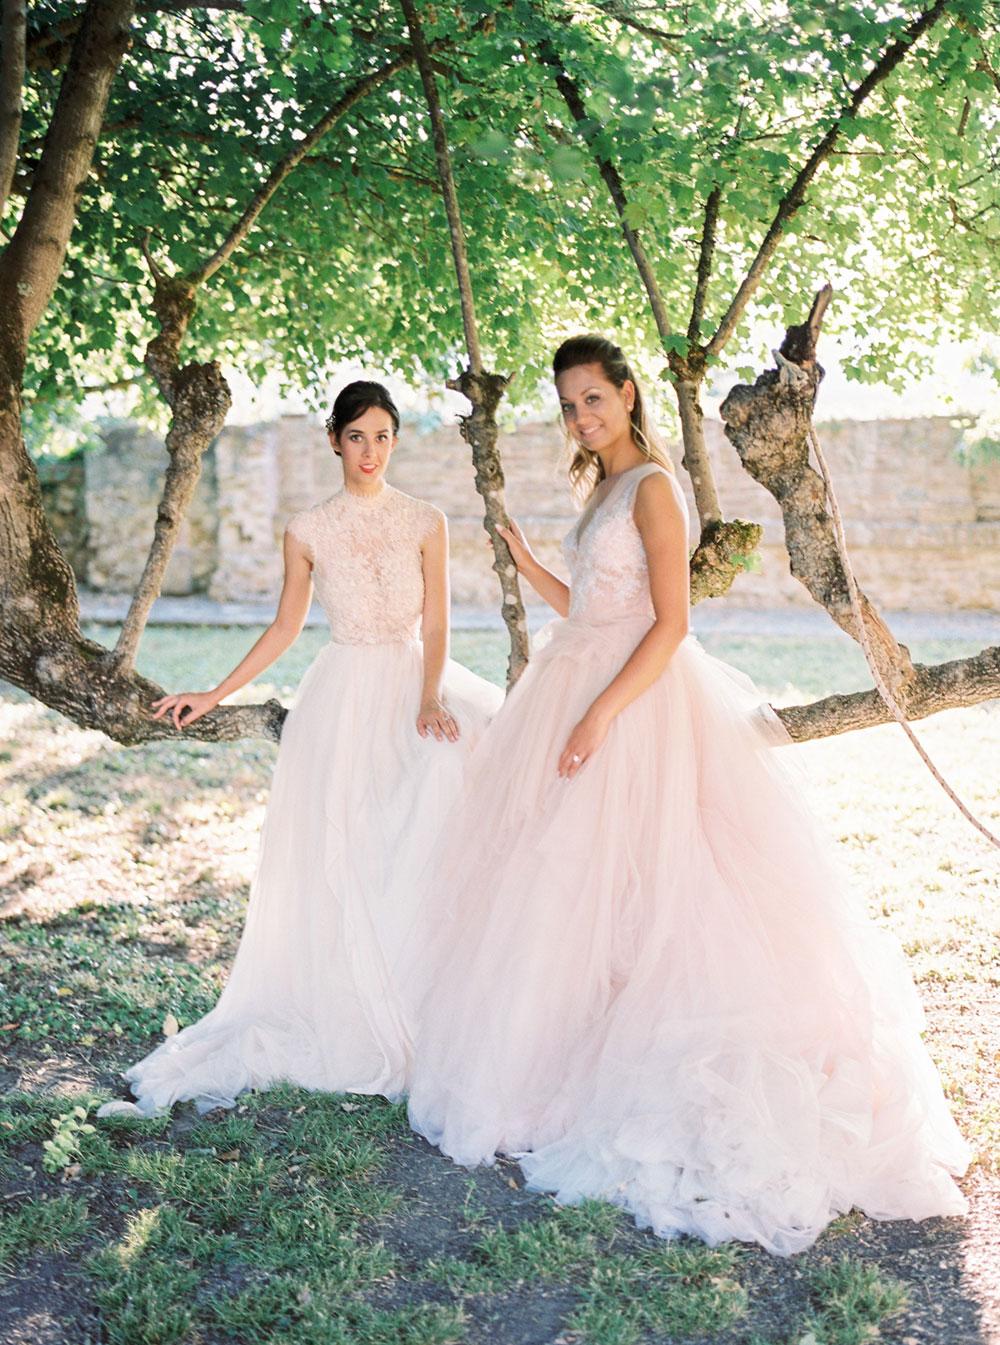 Linari-Tuscany-Elopement-Courtney-Michaela-266